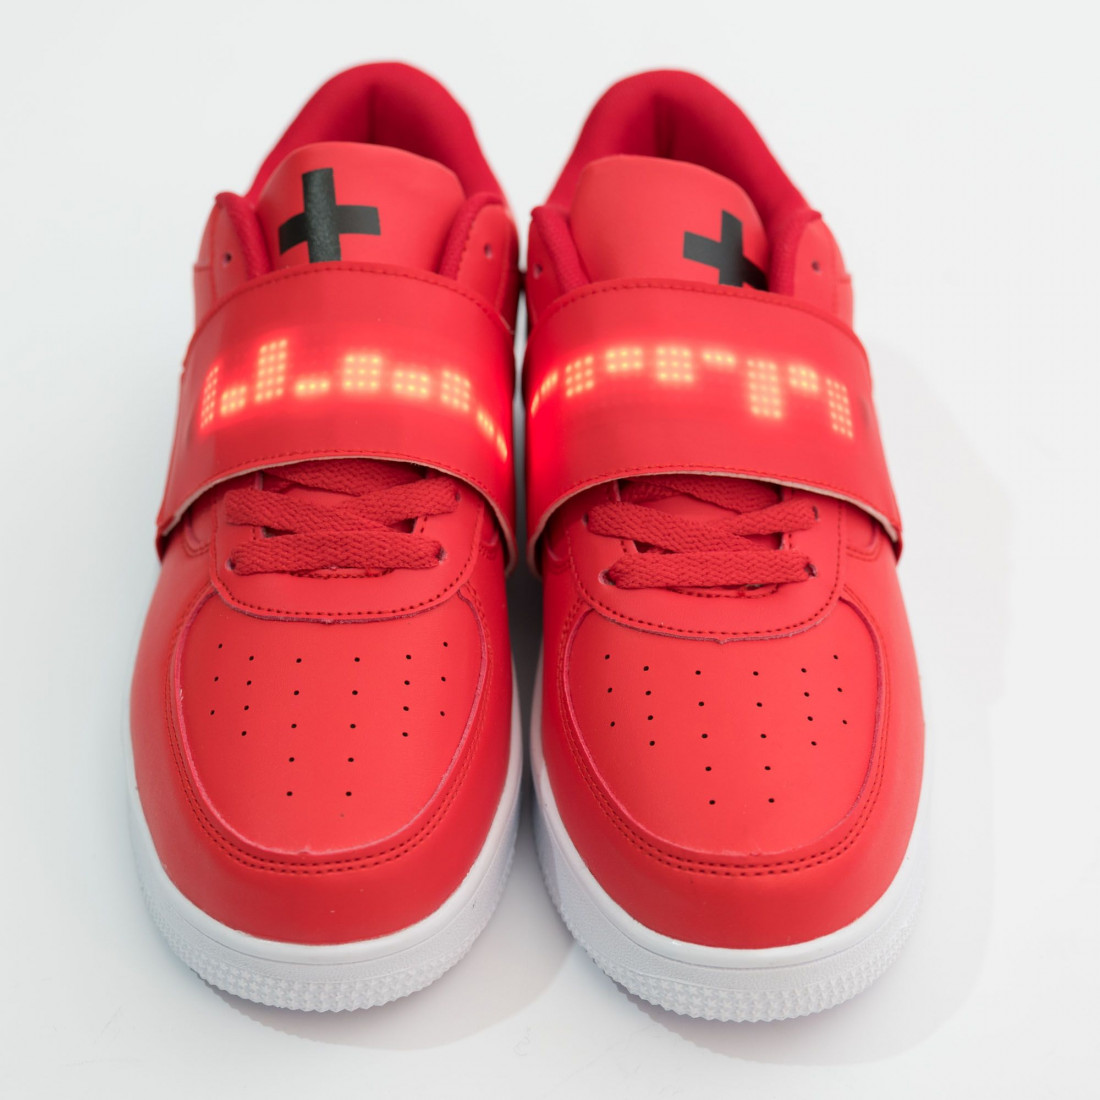 sneakers damen generation space3 red 4181